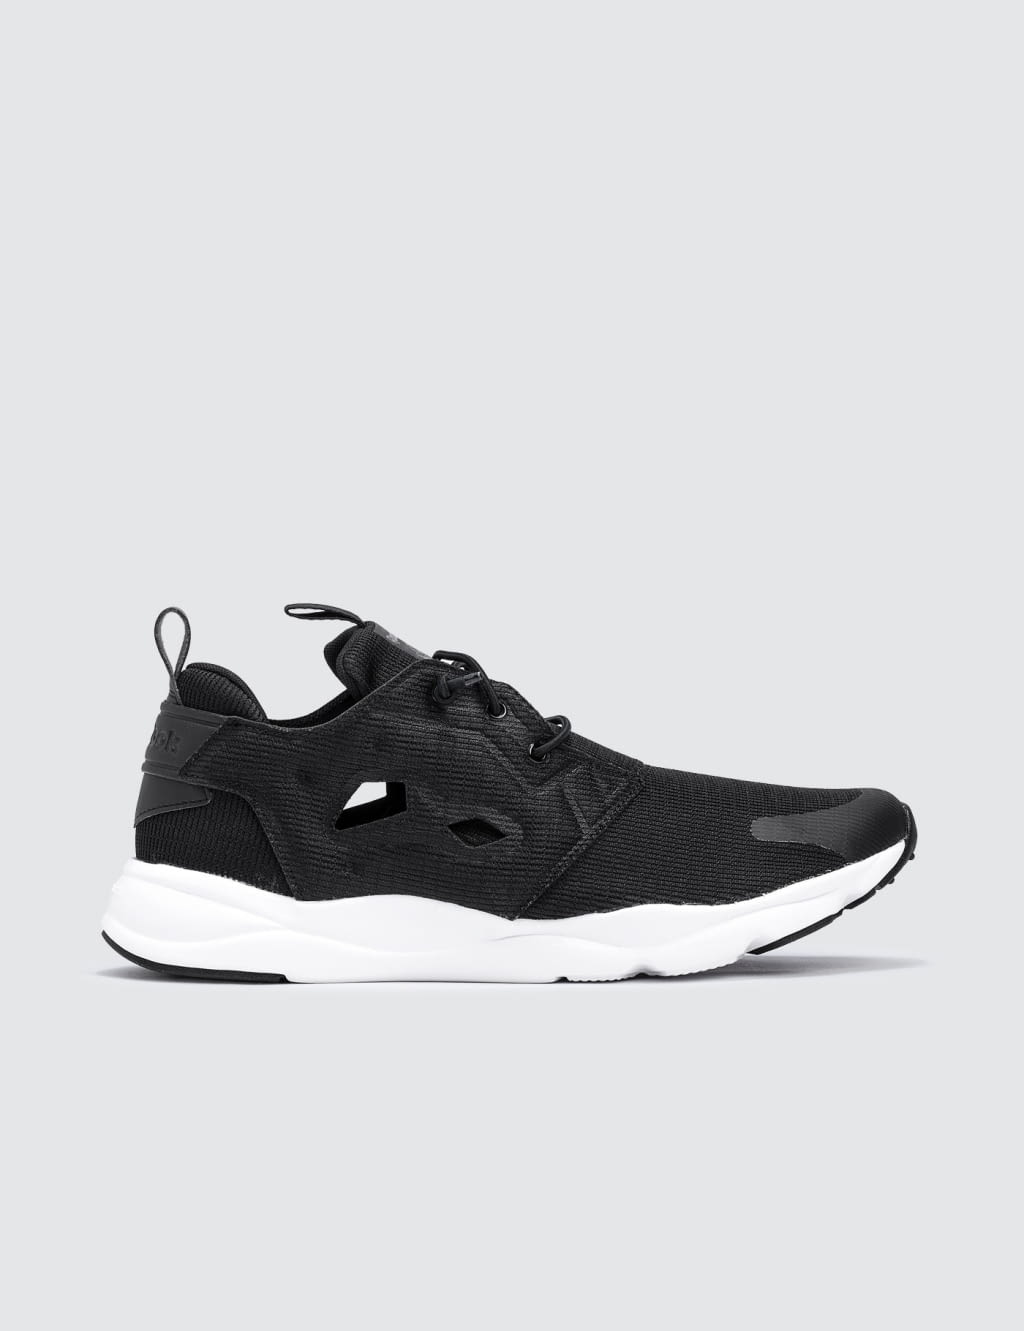 95194eac7cde91 ... black sneakers  reebok furylite aom reebok furylite aom